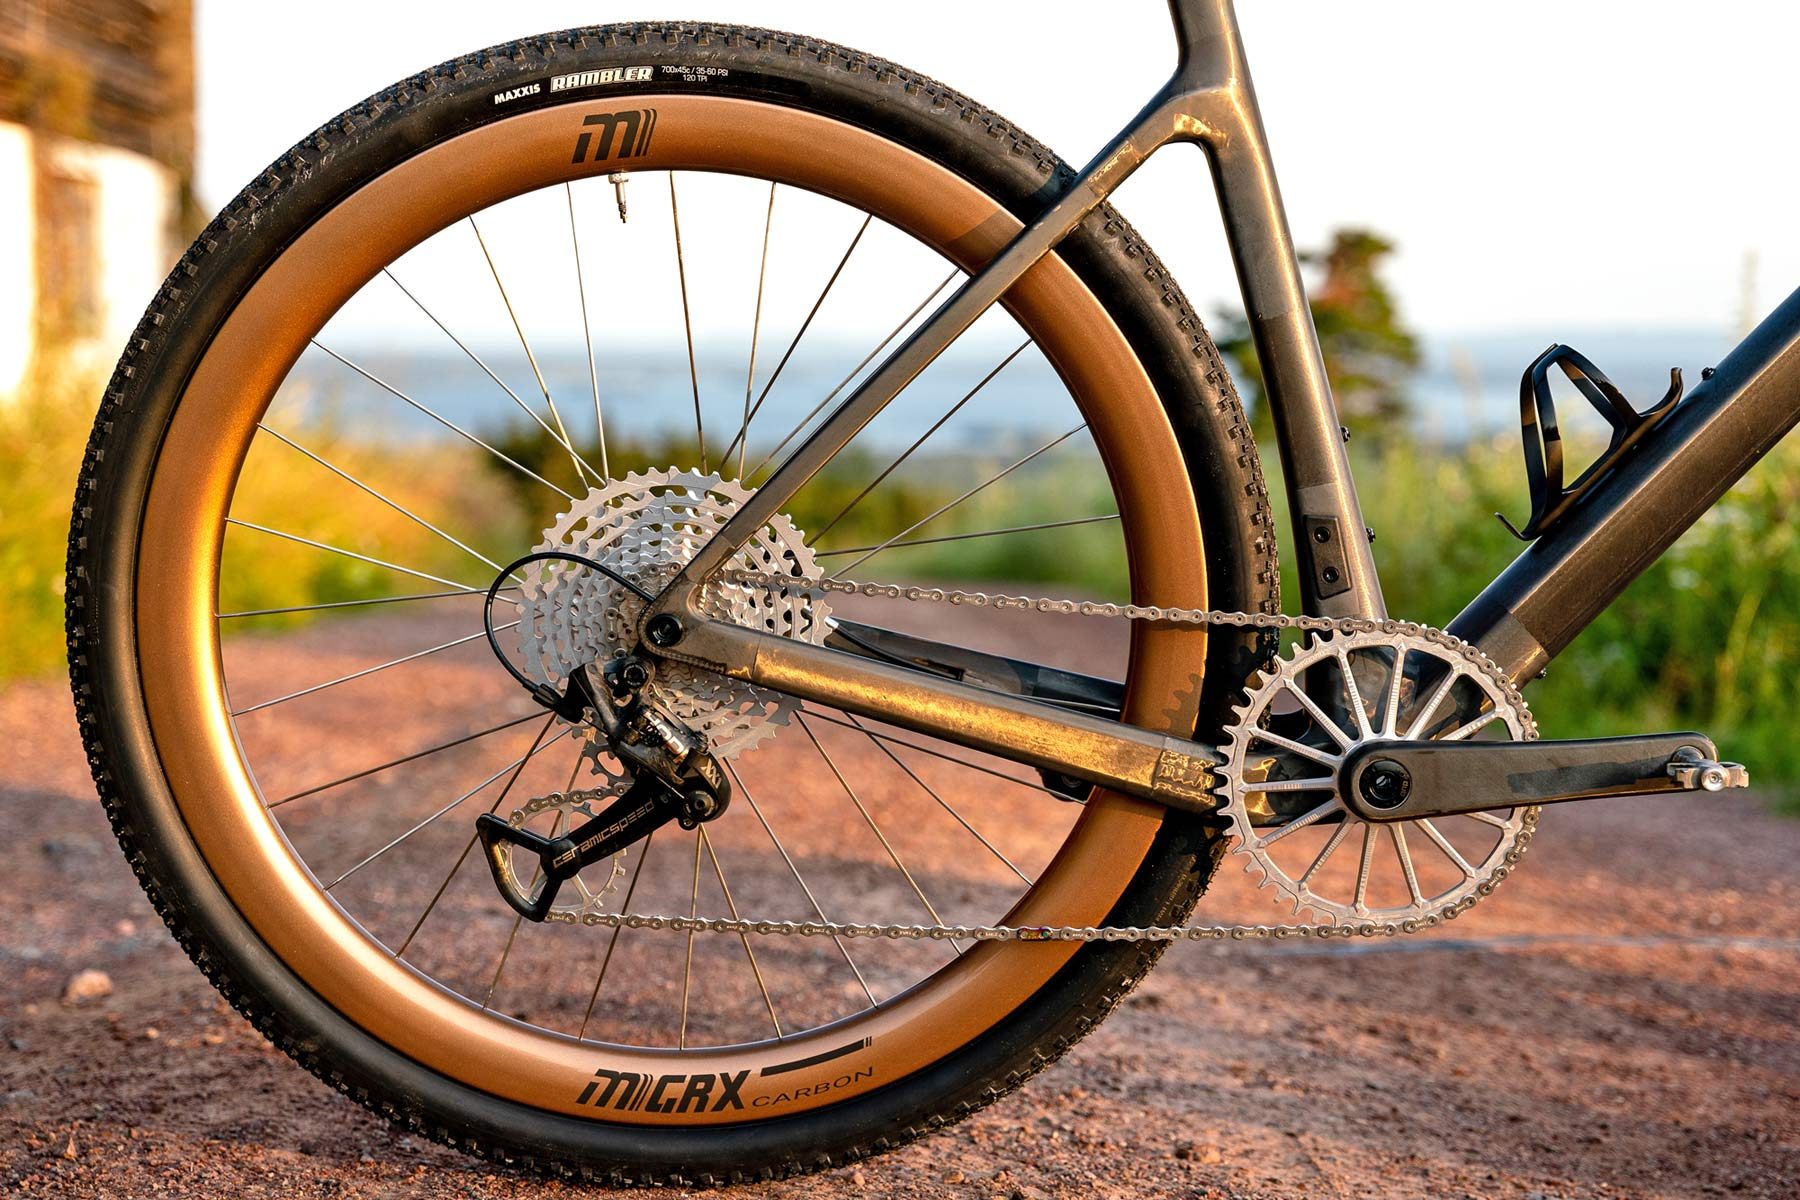 custom Scott Addict Gravel Tuned Dangerholm edition lightweight carbon prototype gravel bike project,1x12-speed drivetrain mechanical